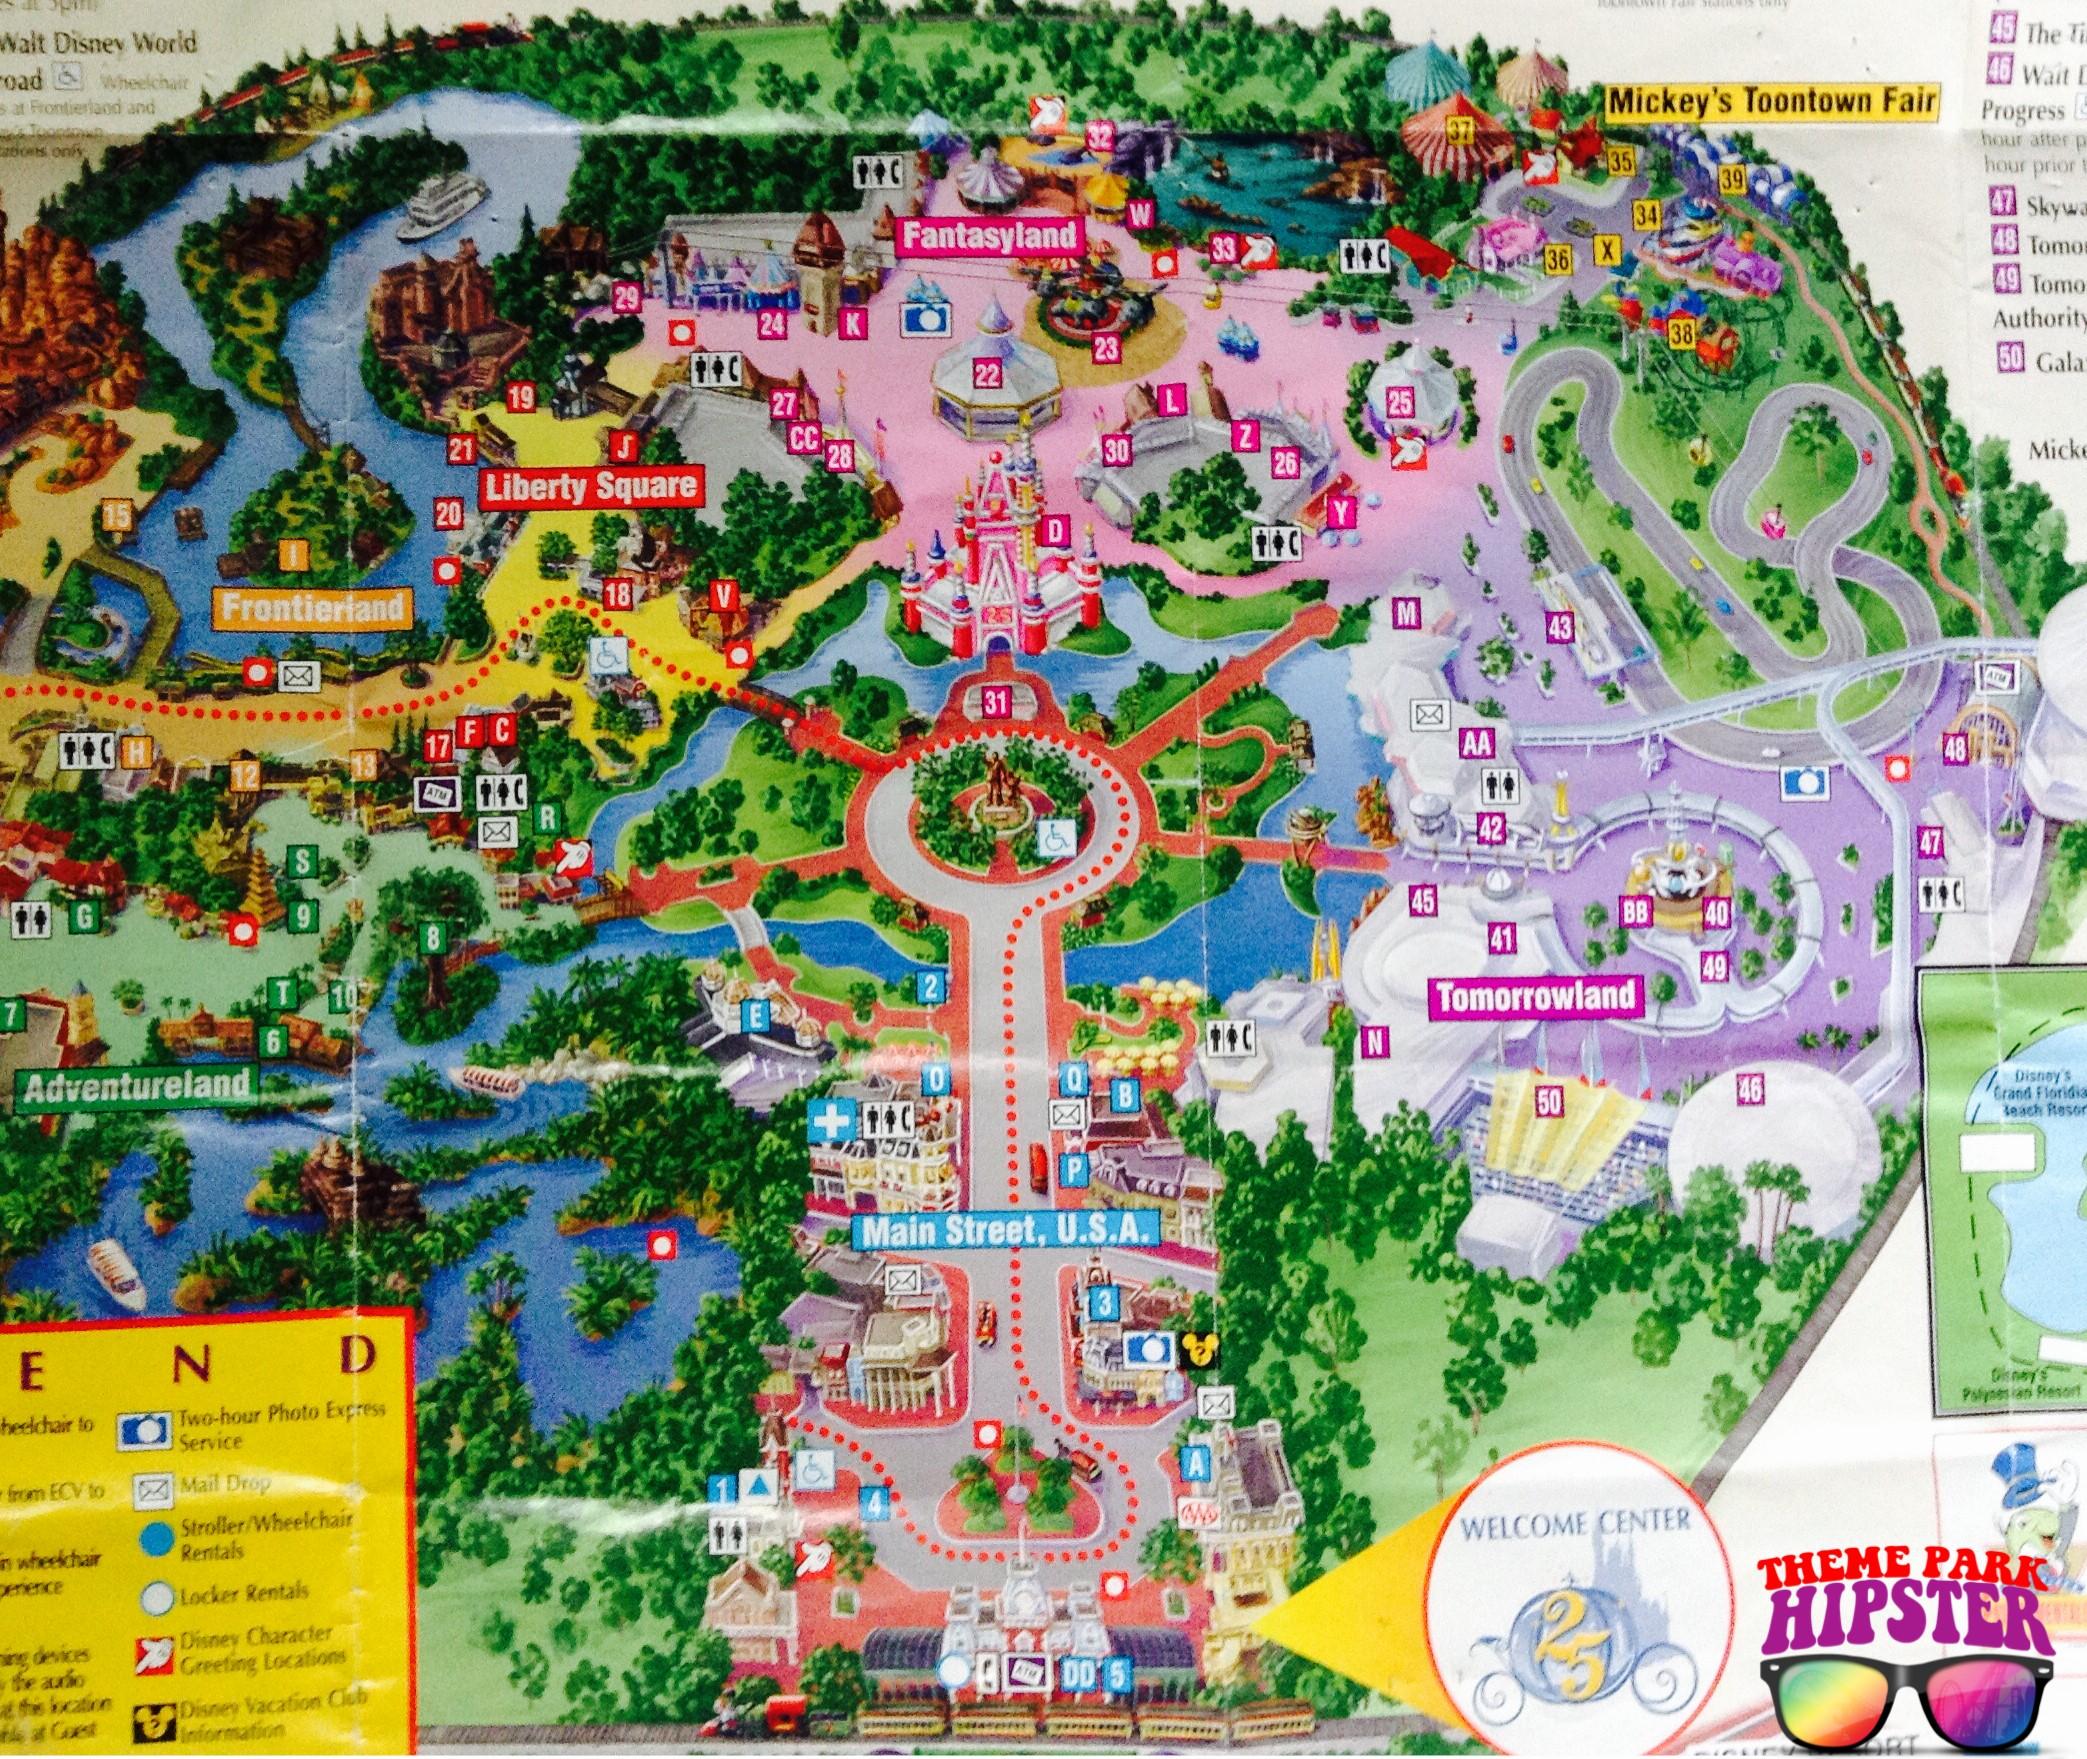 1997 Magic Kingdom Park Map - ThemeParkHipster